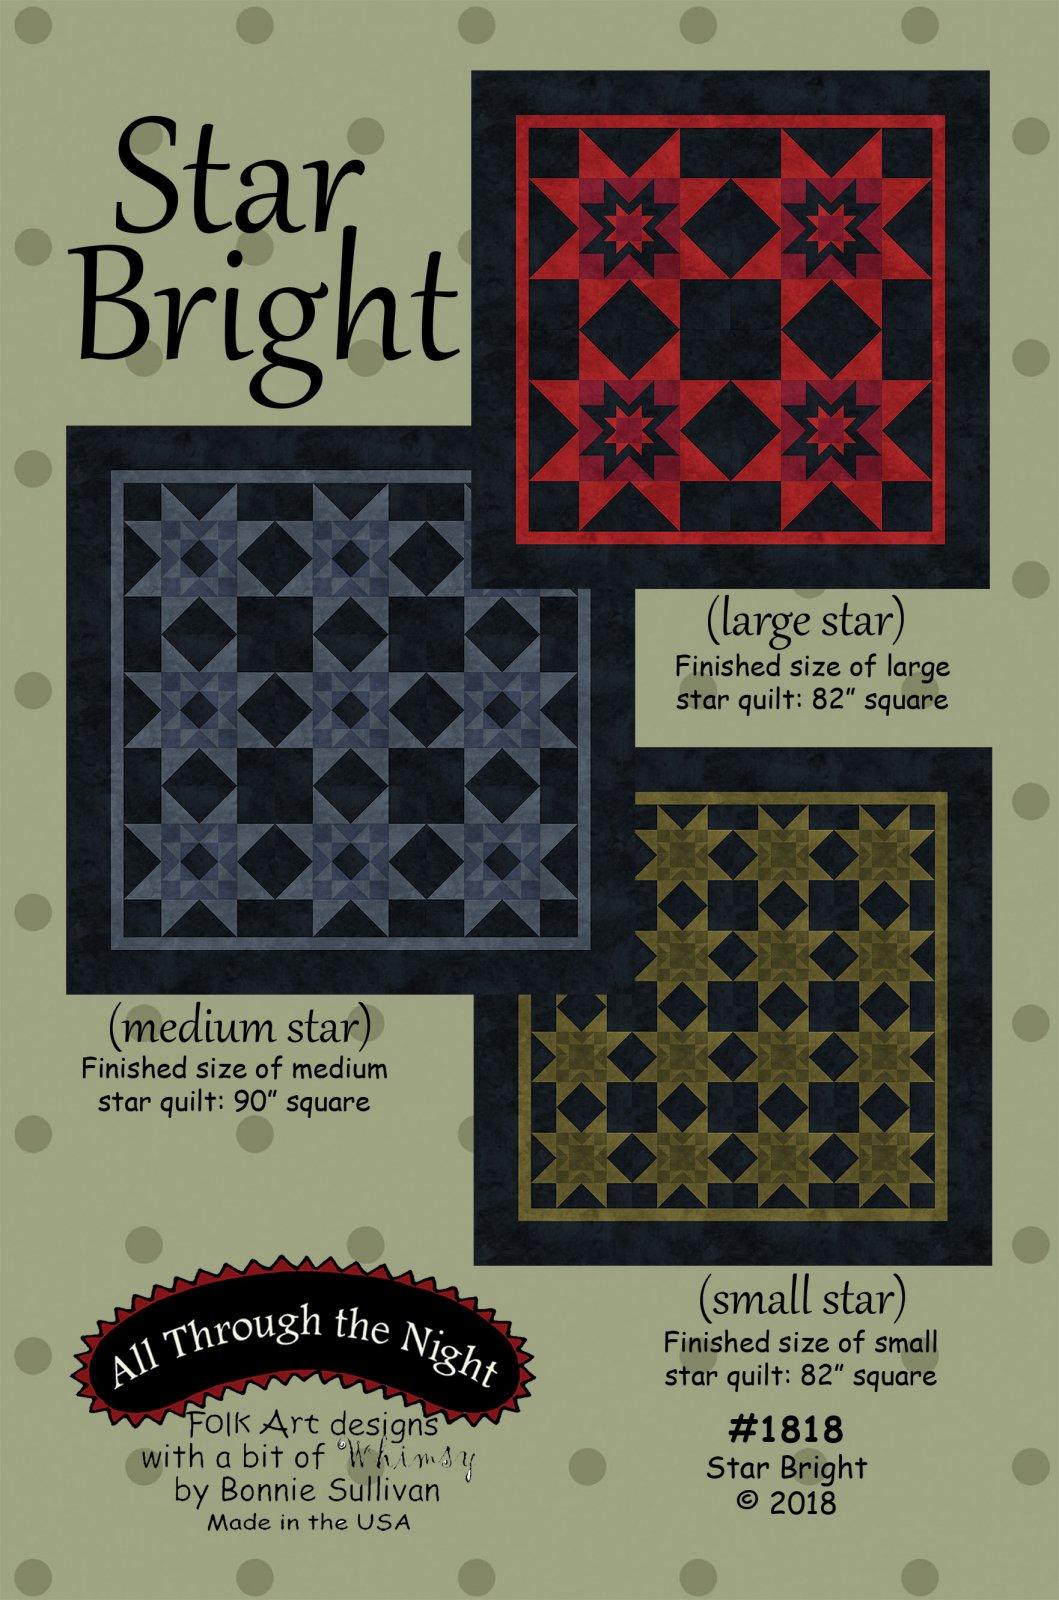 1818 Star Bright